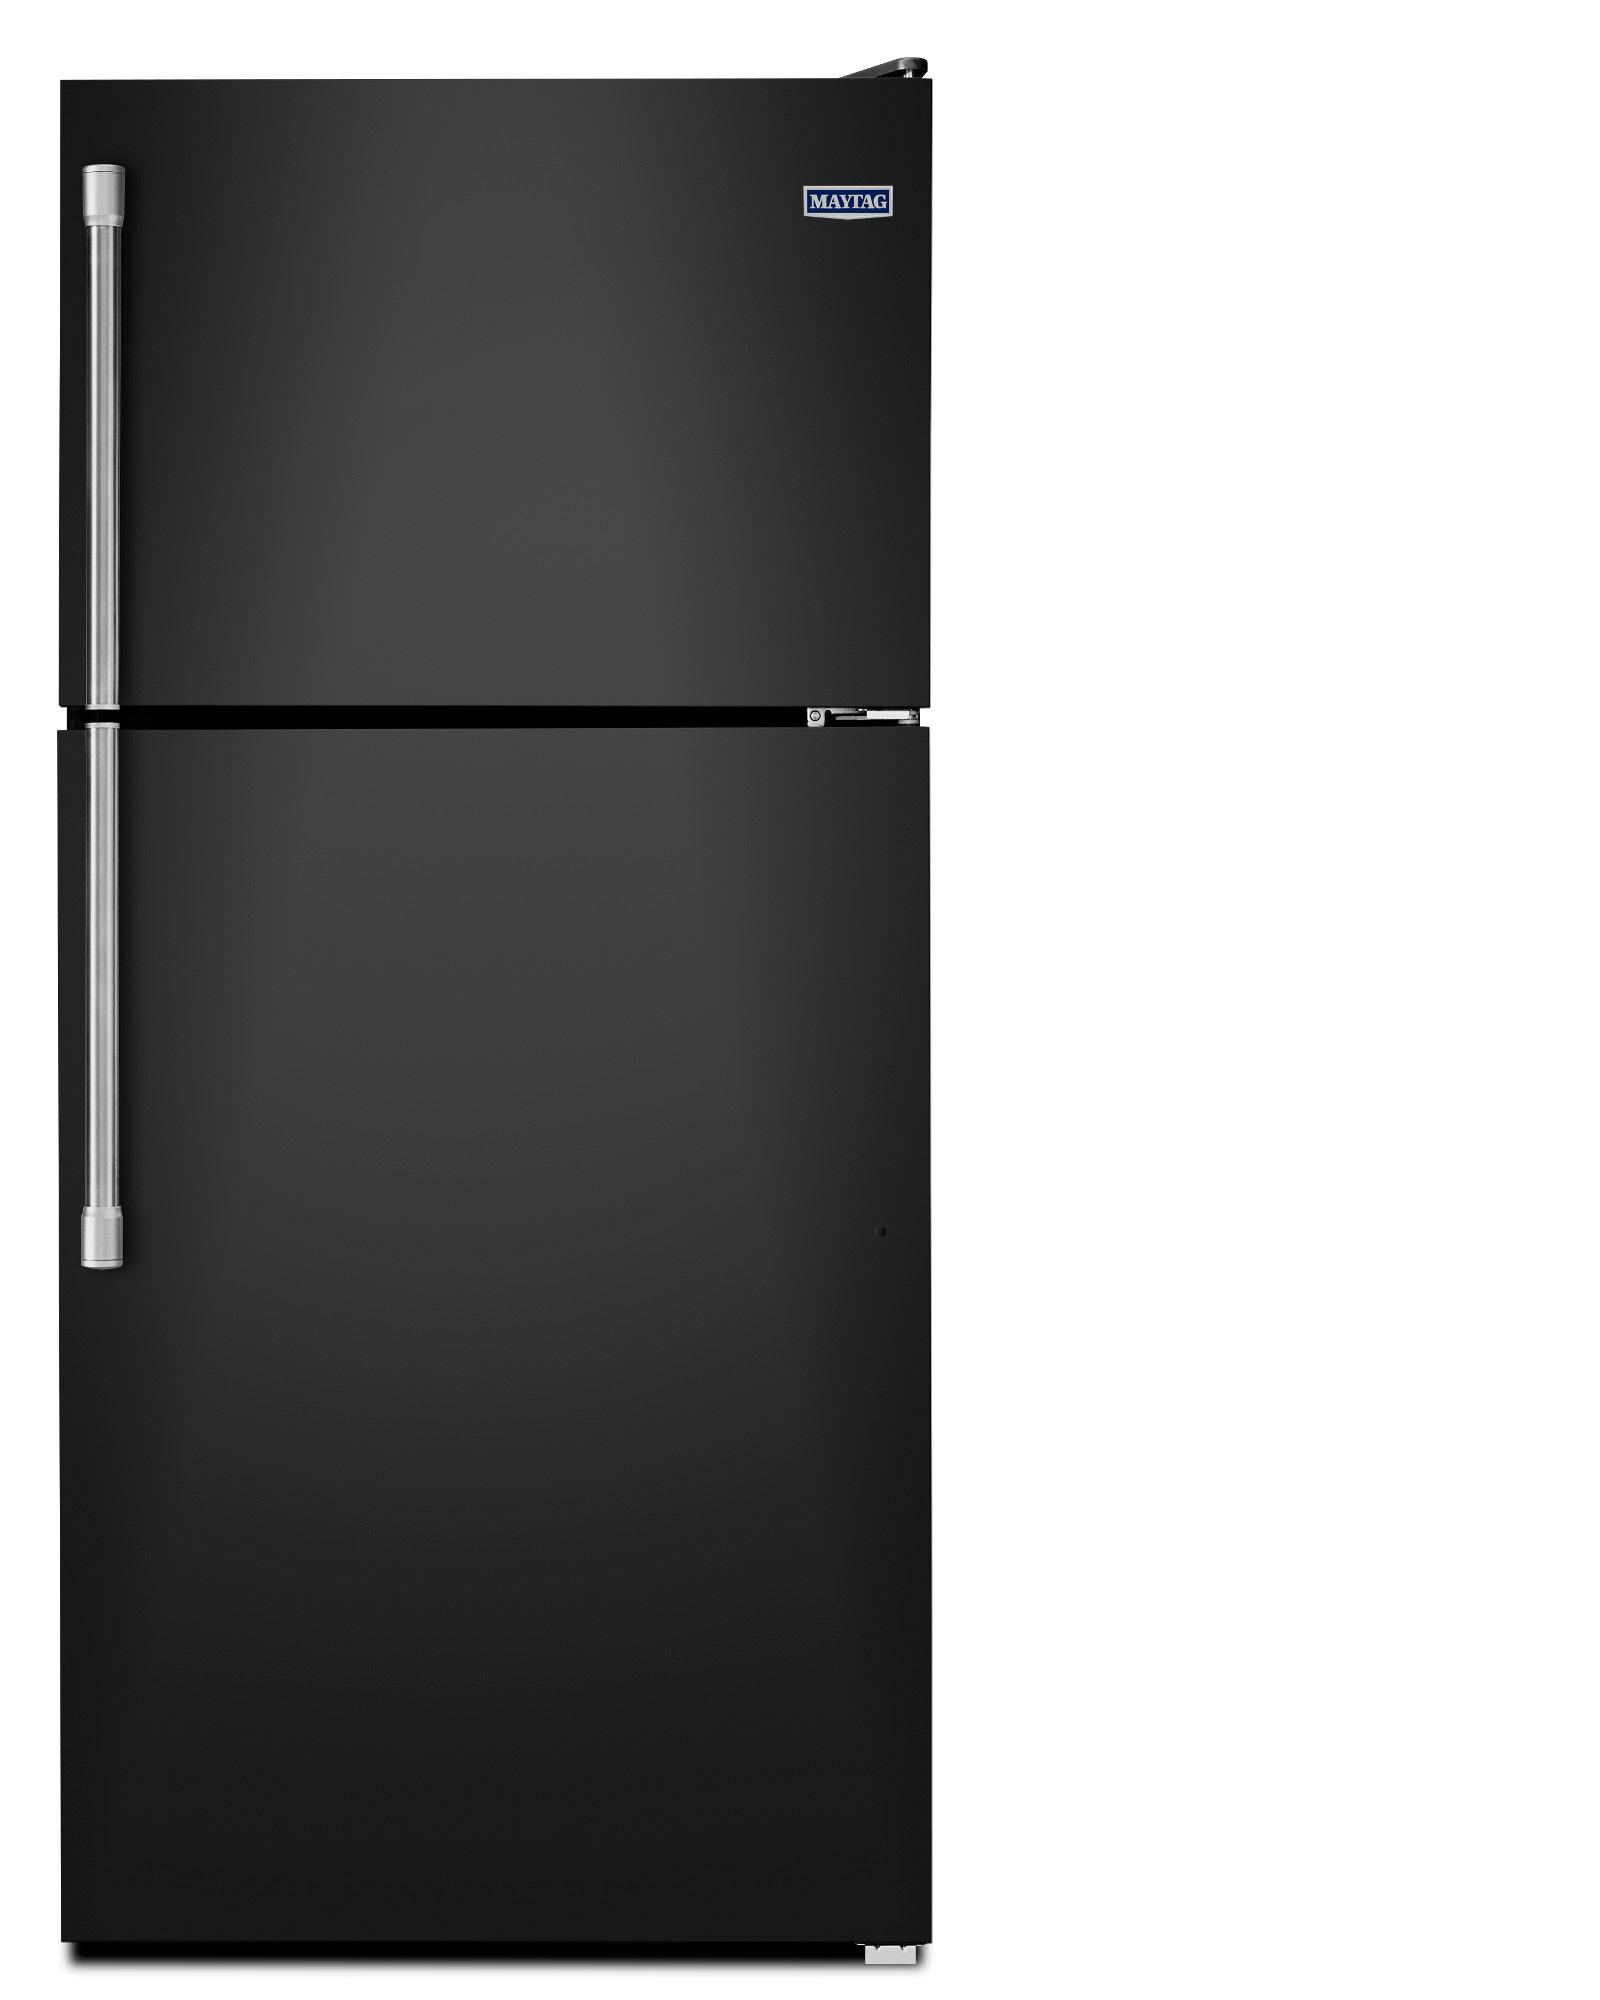 UPC Maytag Refrigerator 18 2 cu ft Top Freezer